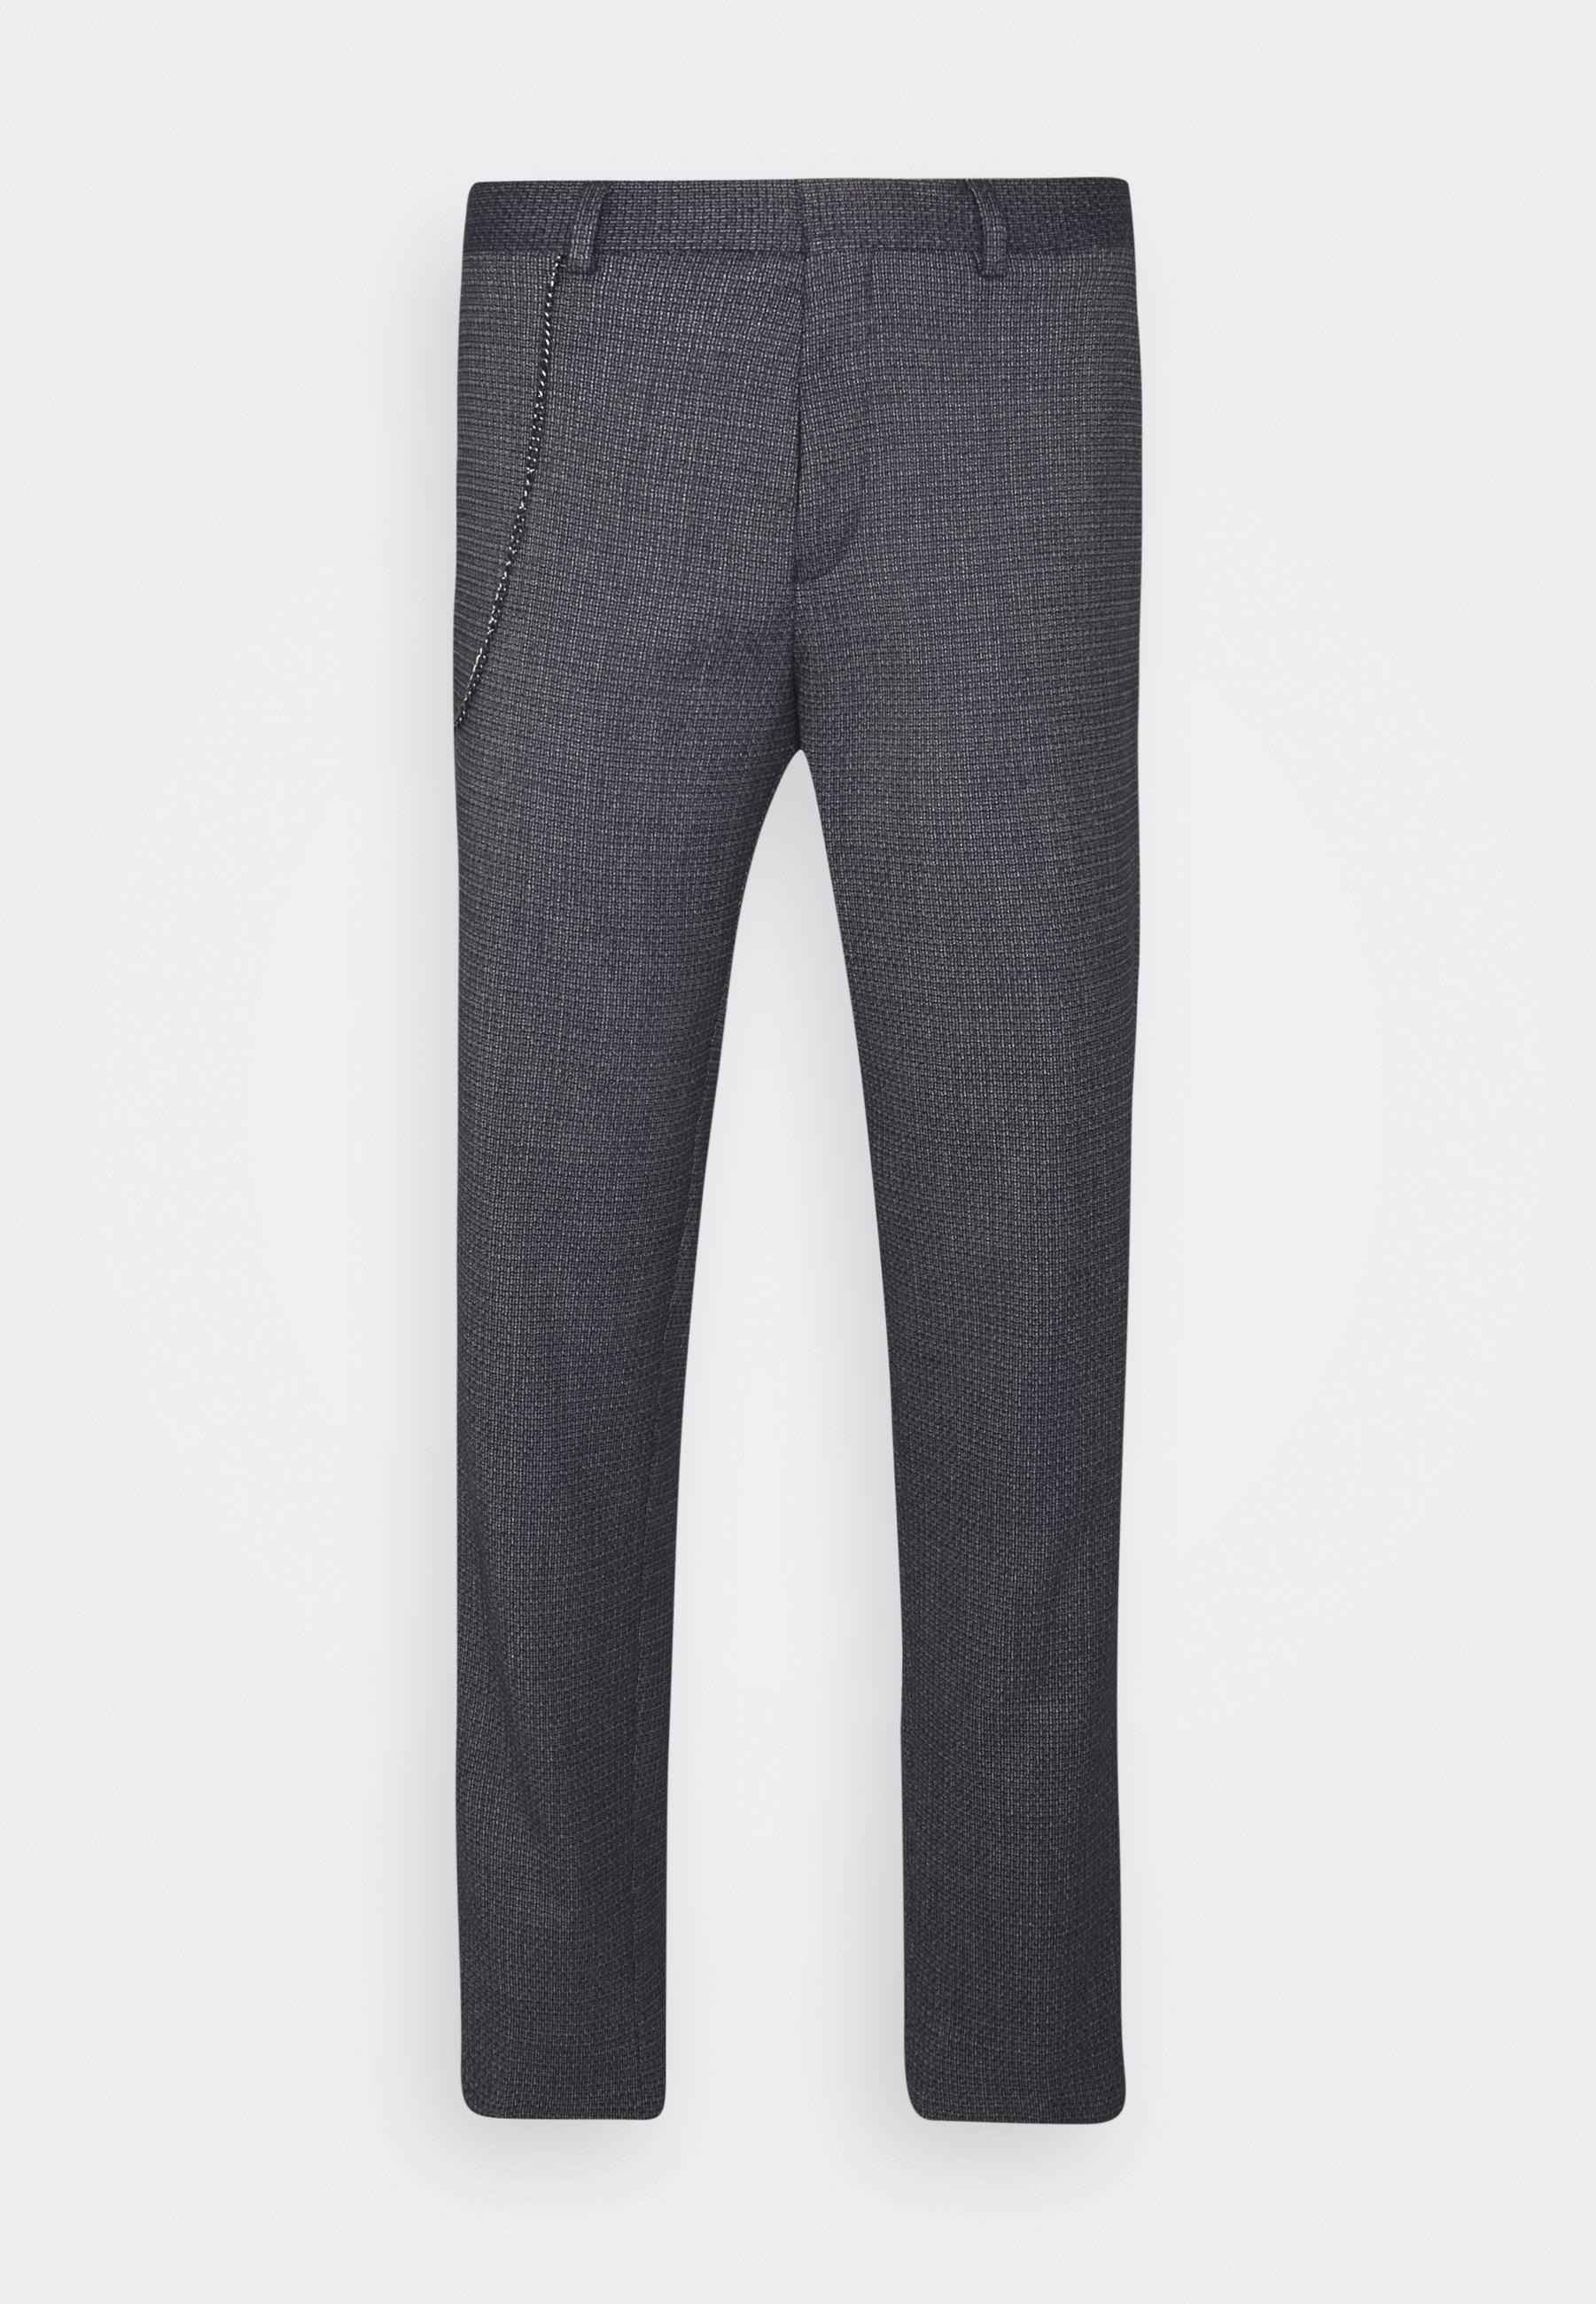 Uomo NORTHCOMBE TROUSER - Pantaloni